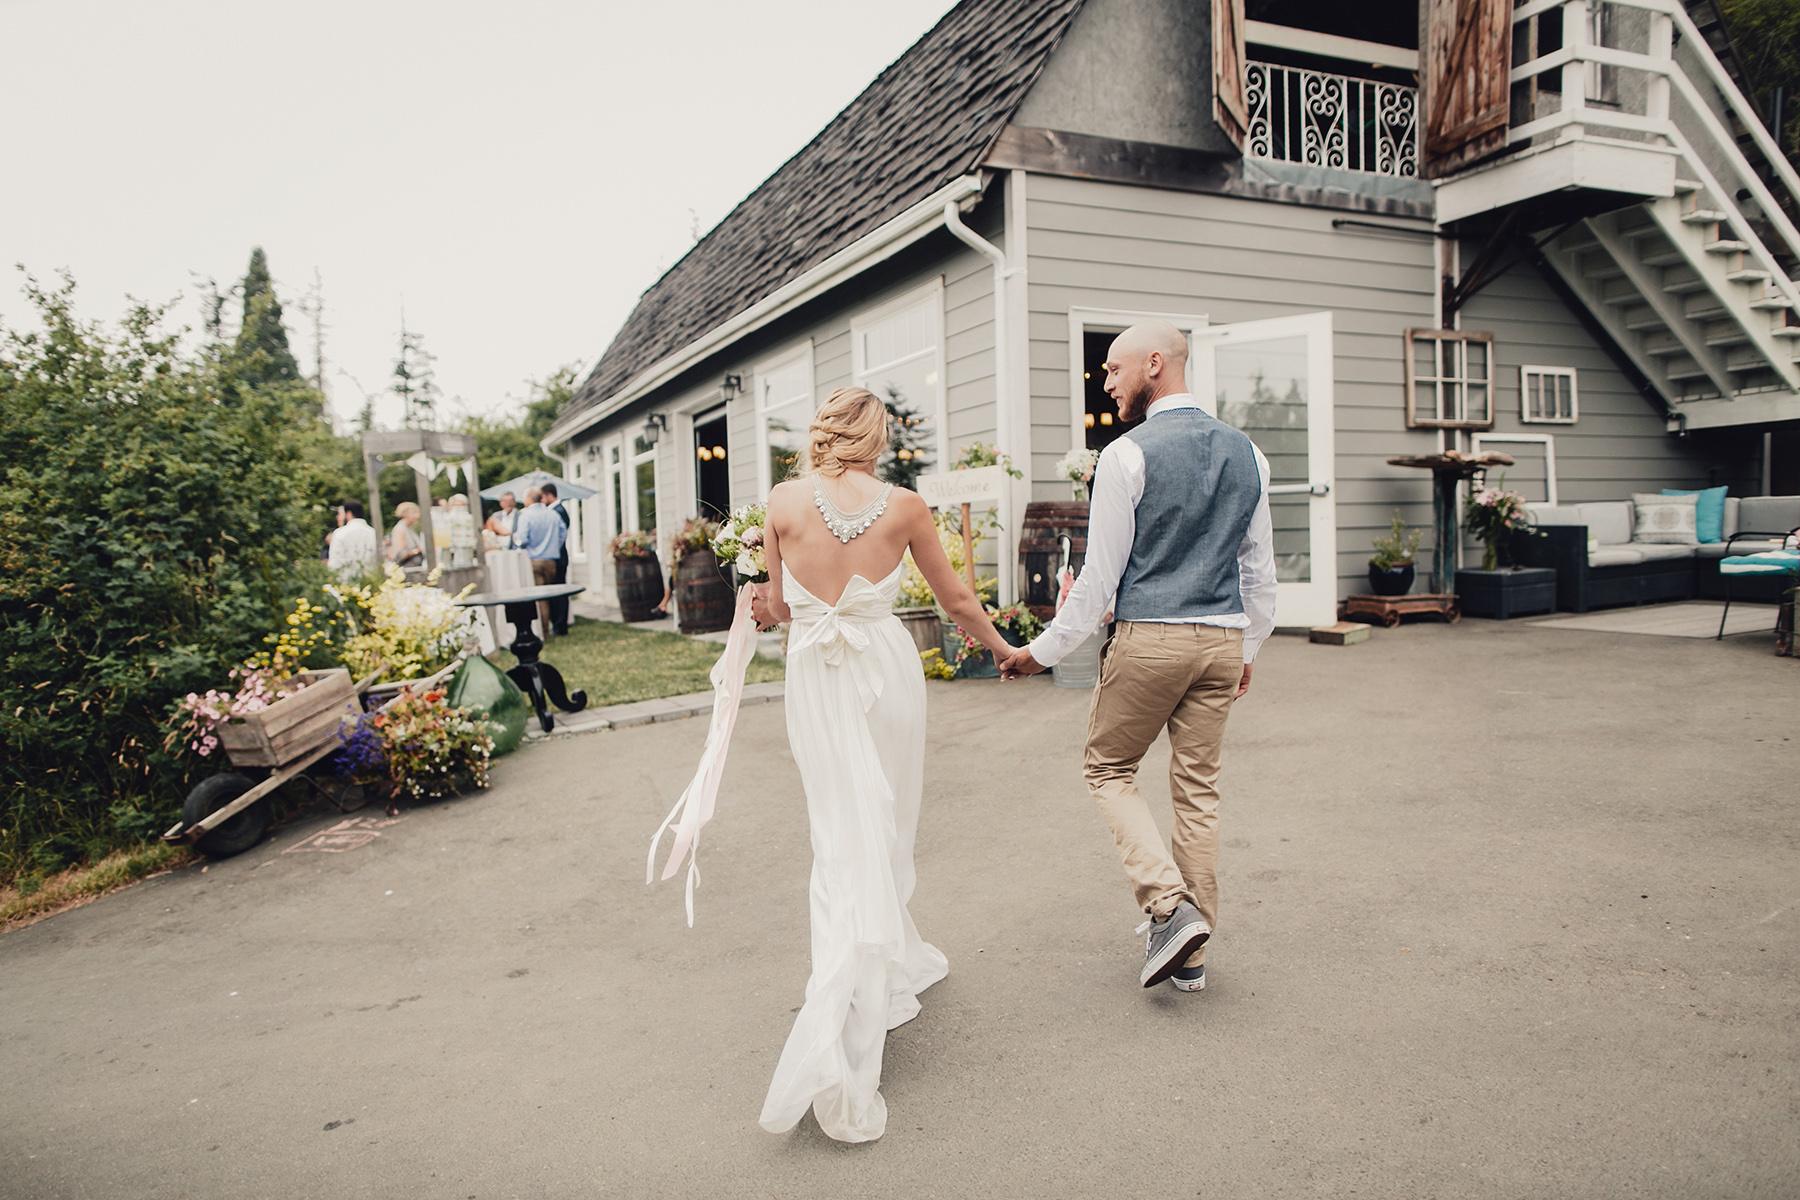 kildara-farms-wedding-photo-inspiration-0076